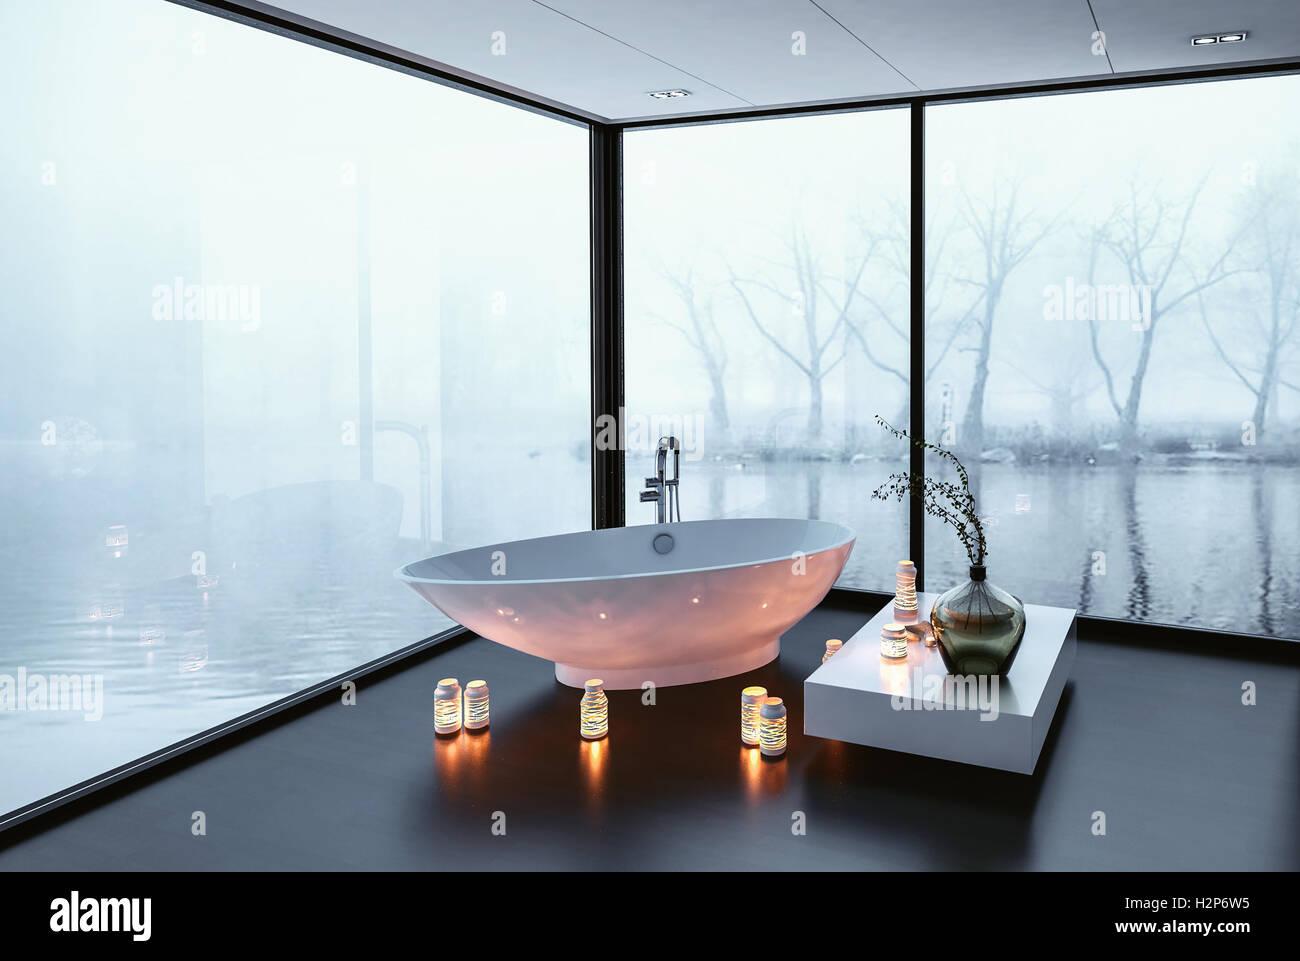 Freestanding Bathtubs Stock Photos & Freestanding Bathtubs Stock ...